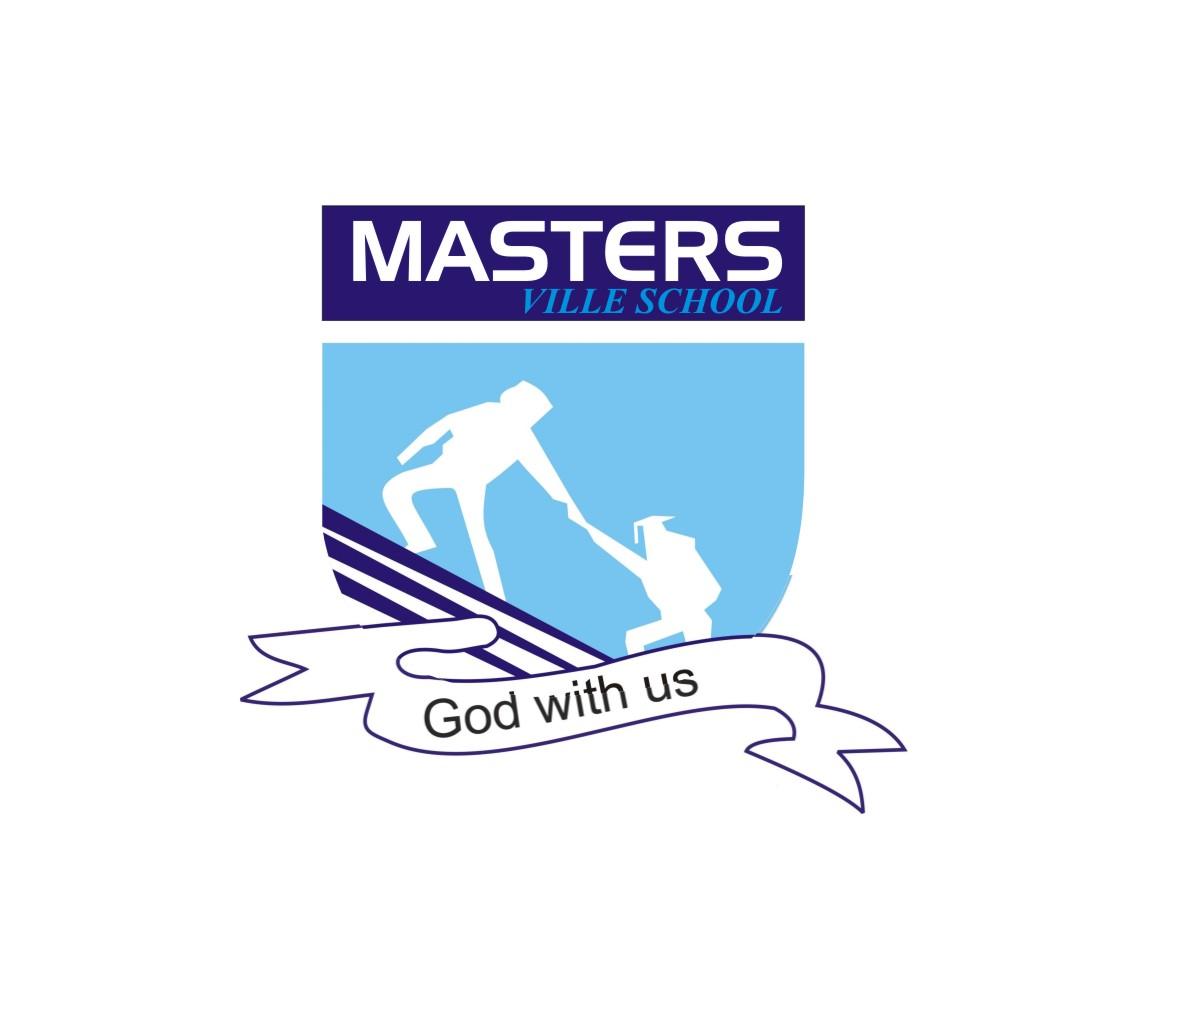 MastersVille Schools, Ajao Estate, Lagos